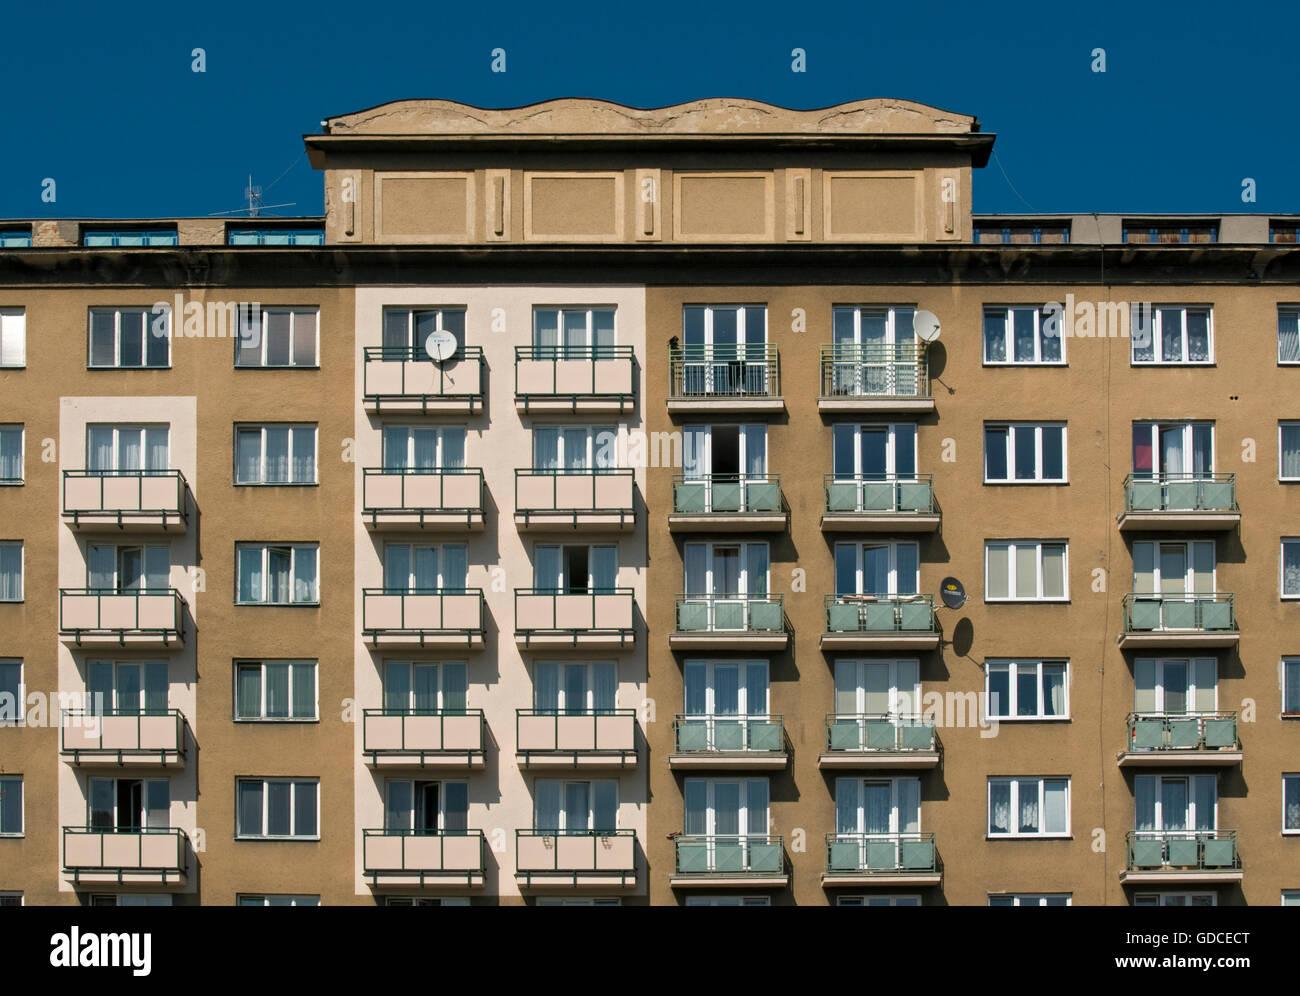 Apartment building, socialist realism style in 1950s, Hlavni trida, Poruba district of Ostrava, Czech Republic, - Stock Image